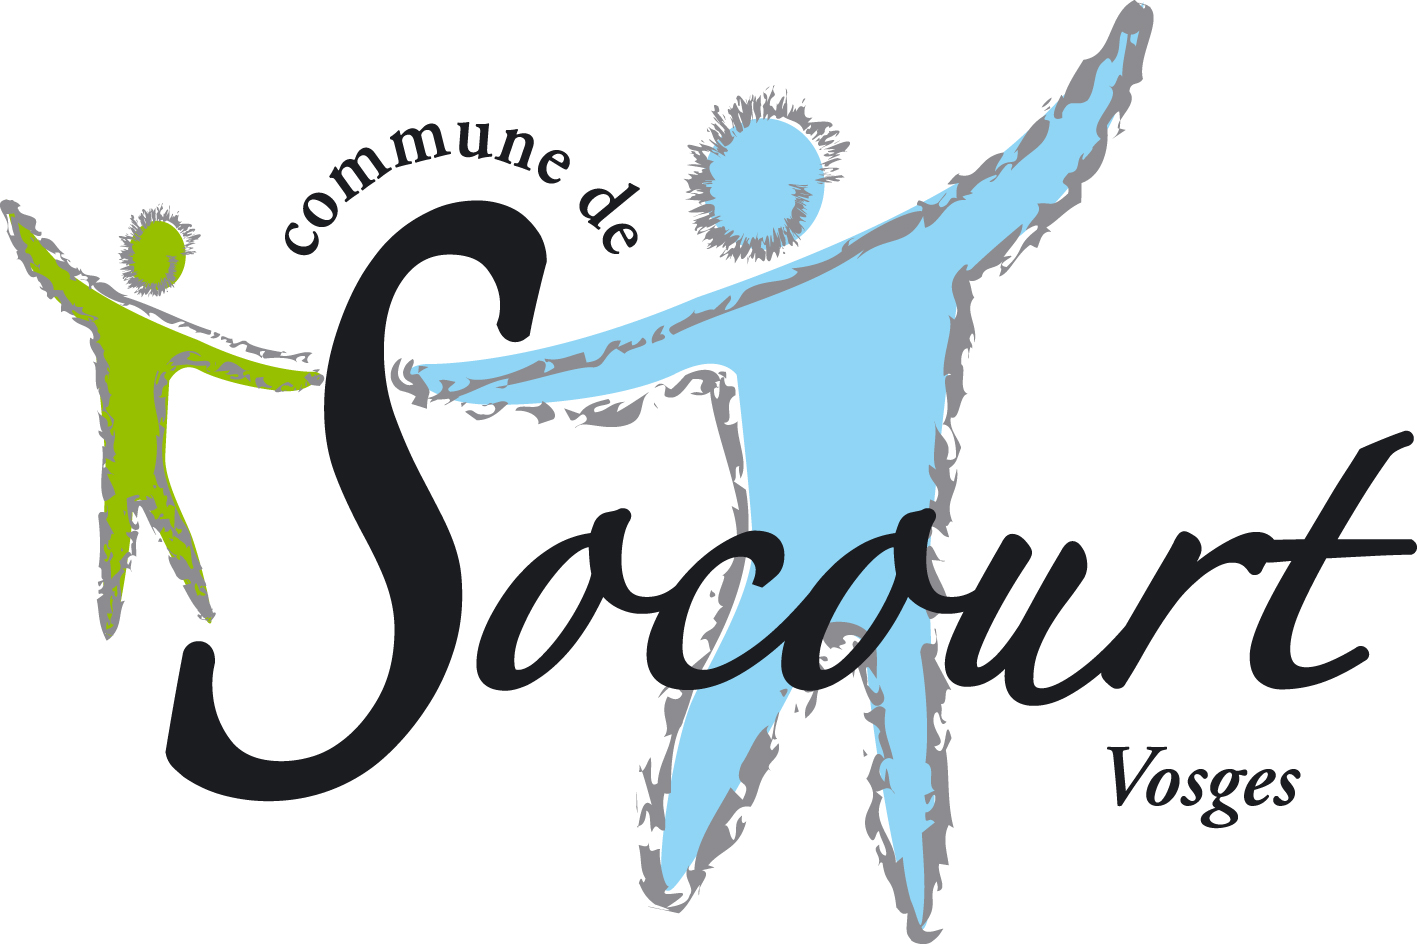 Socourt